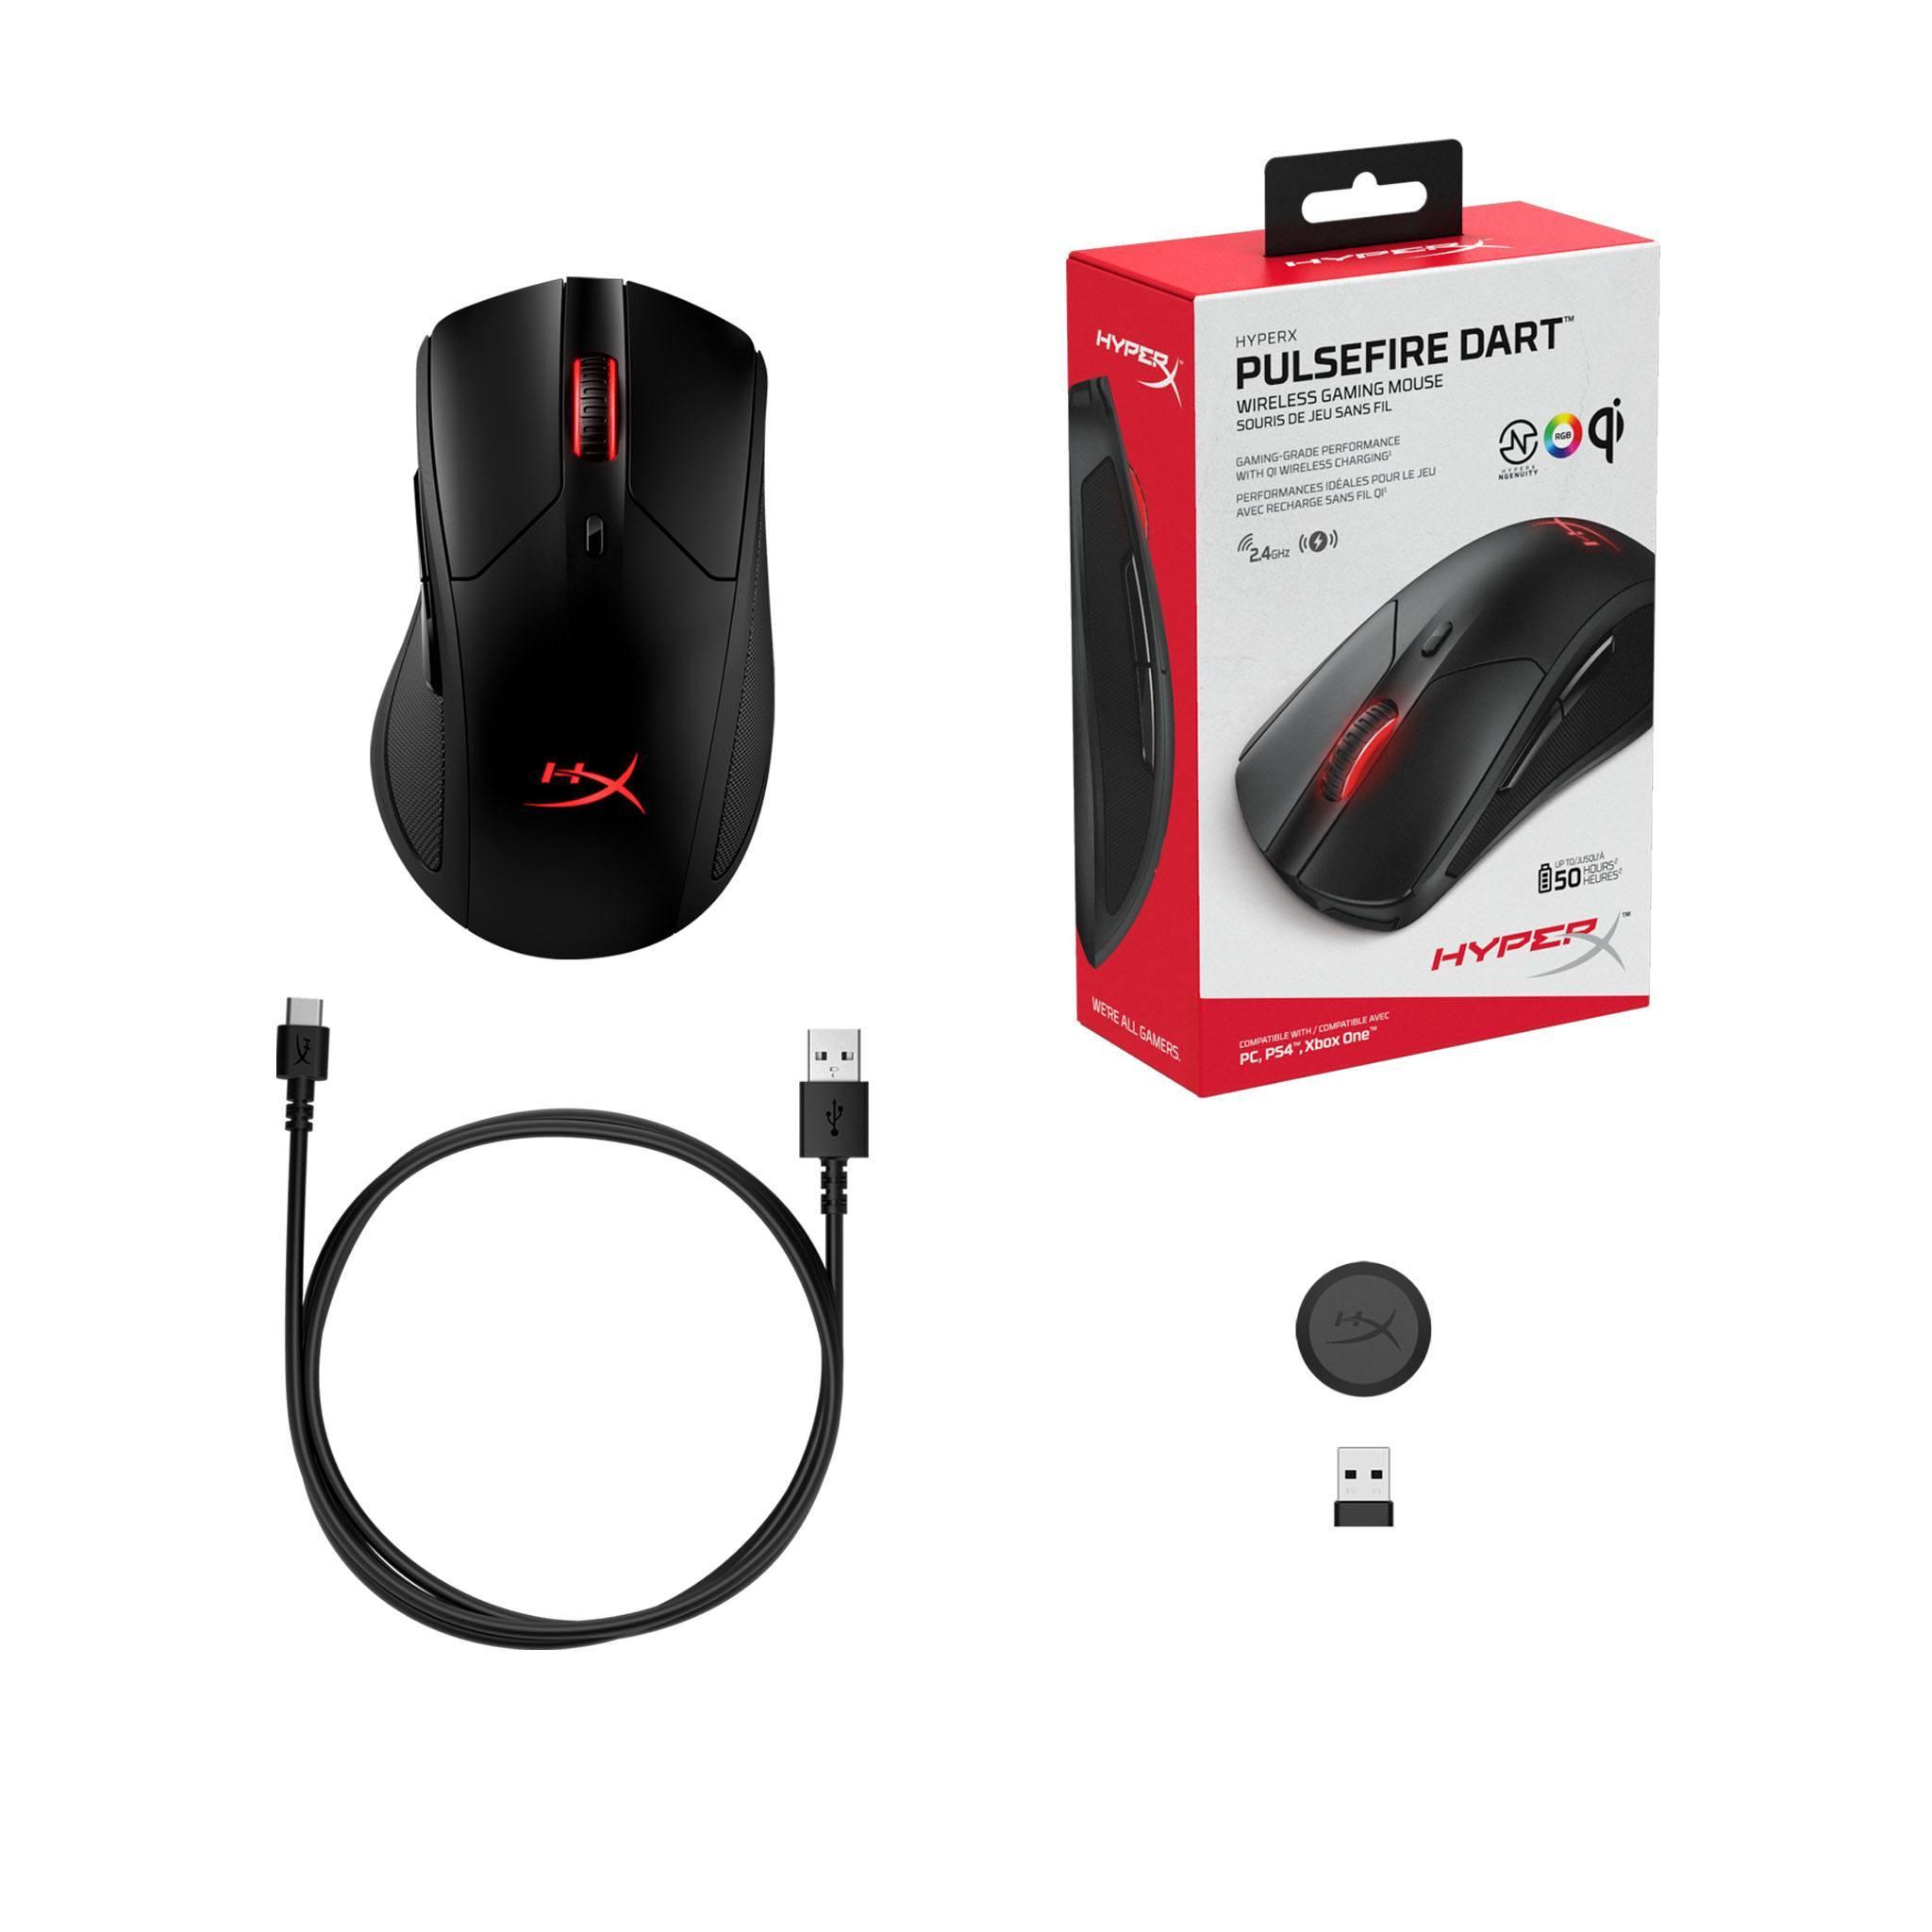 Souris gamer Pulsefire Dart Wireless RGB HyperX